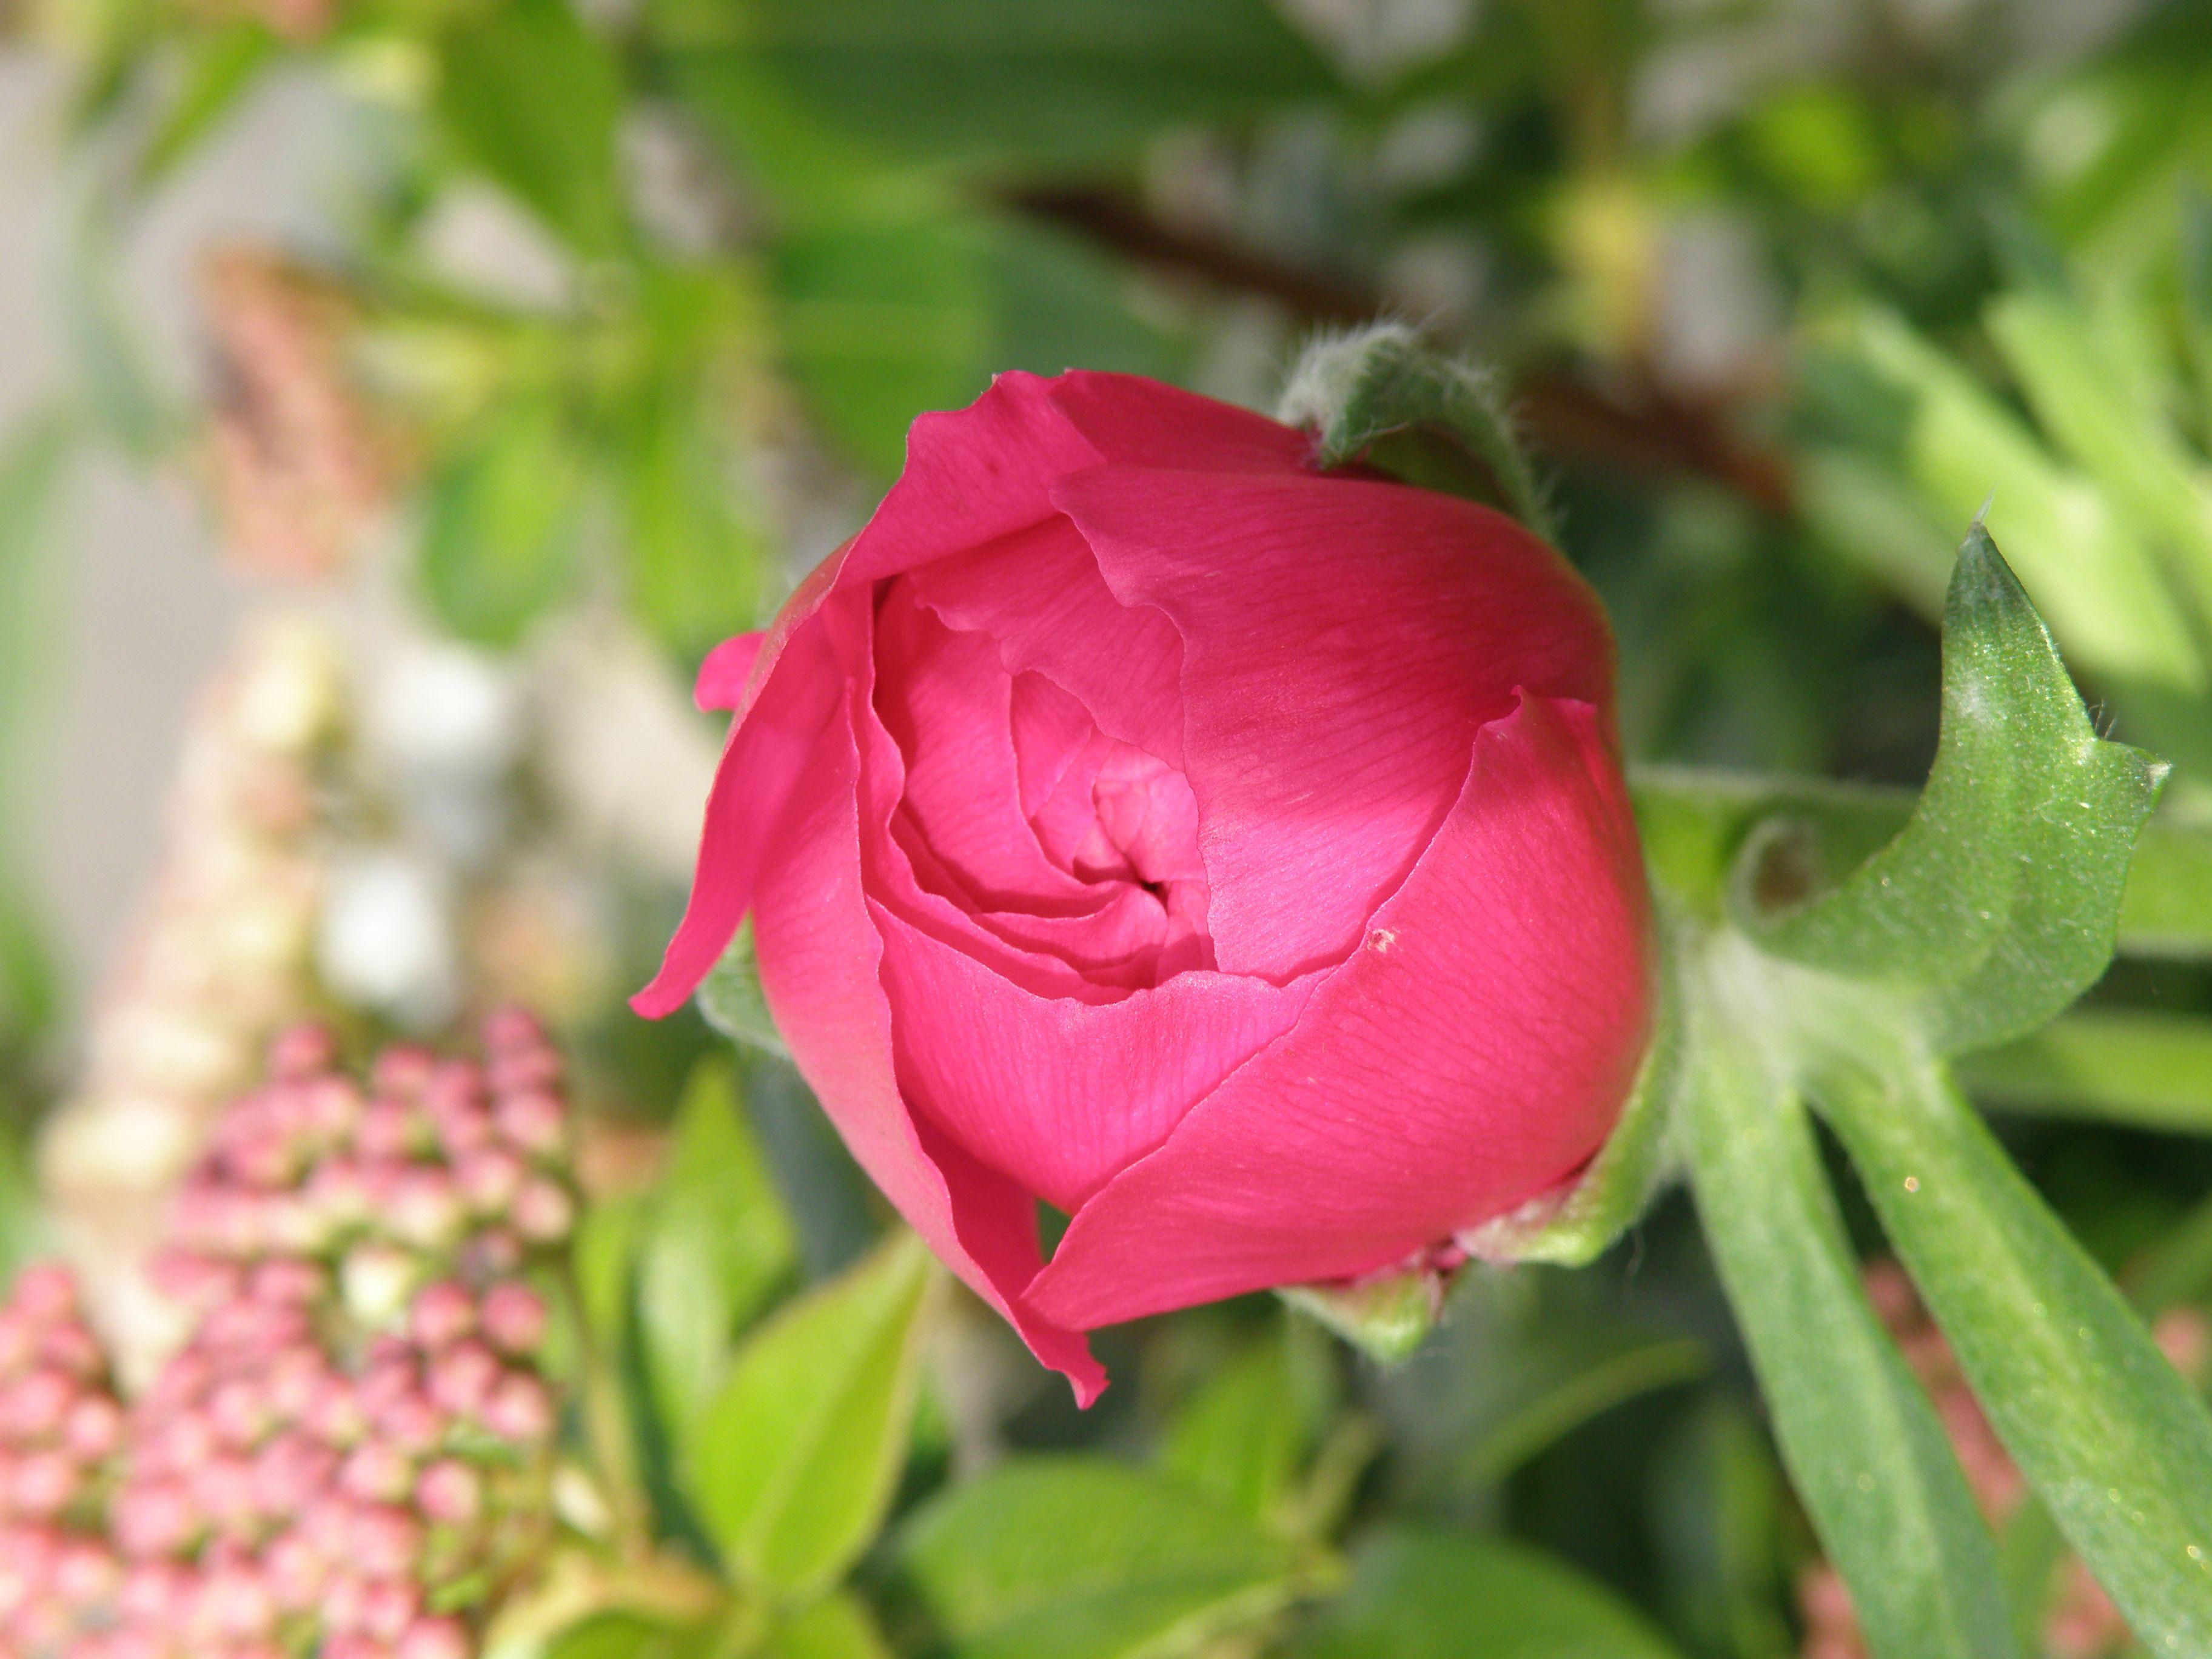 9055aa9f273faf1eab7b526779da1cc0 Luxe De Fleurs De Jardin Des Idées